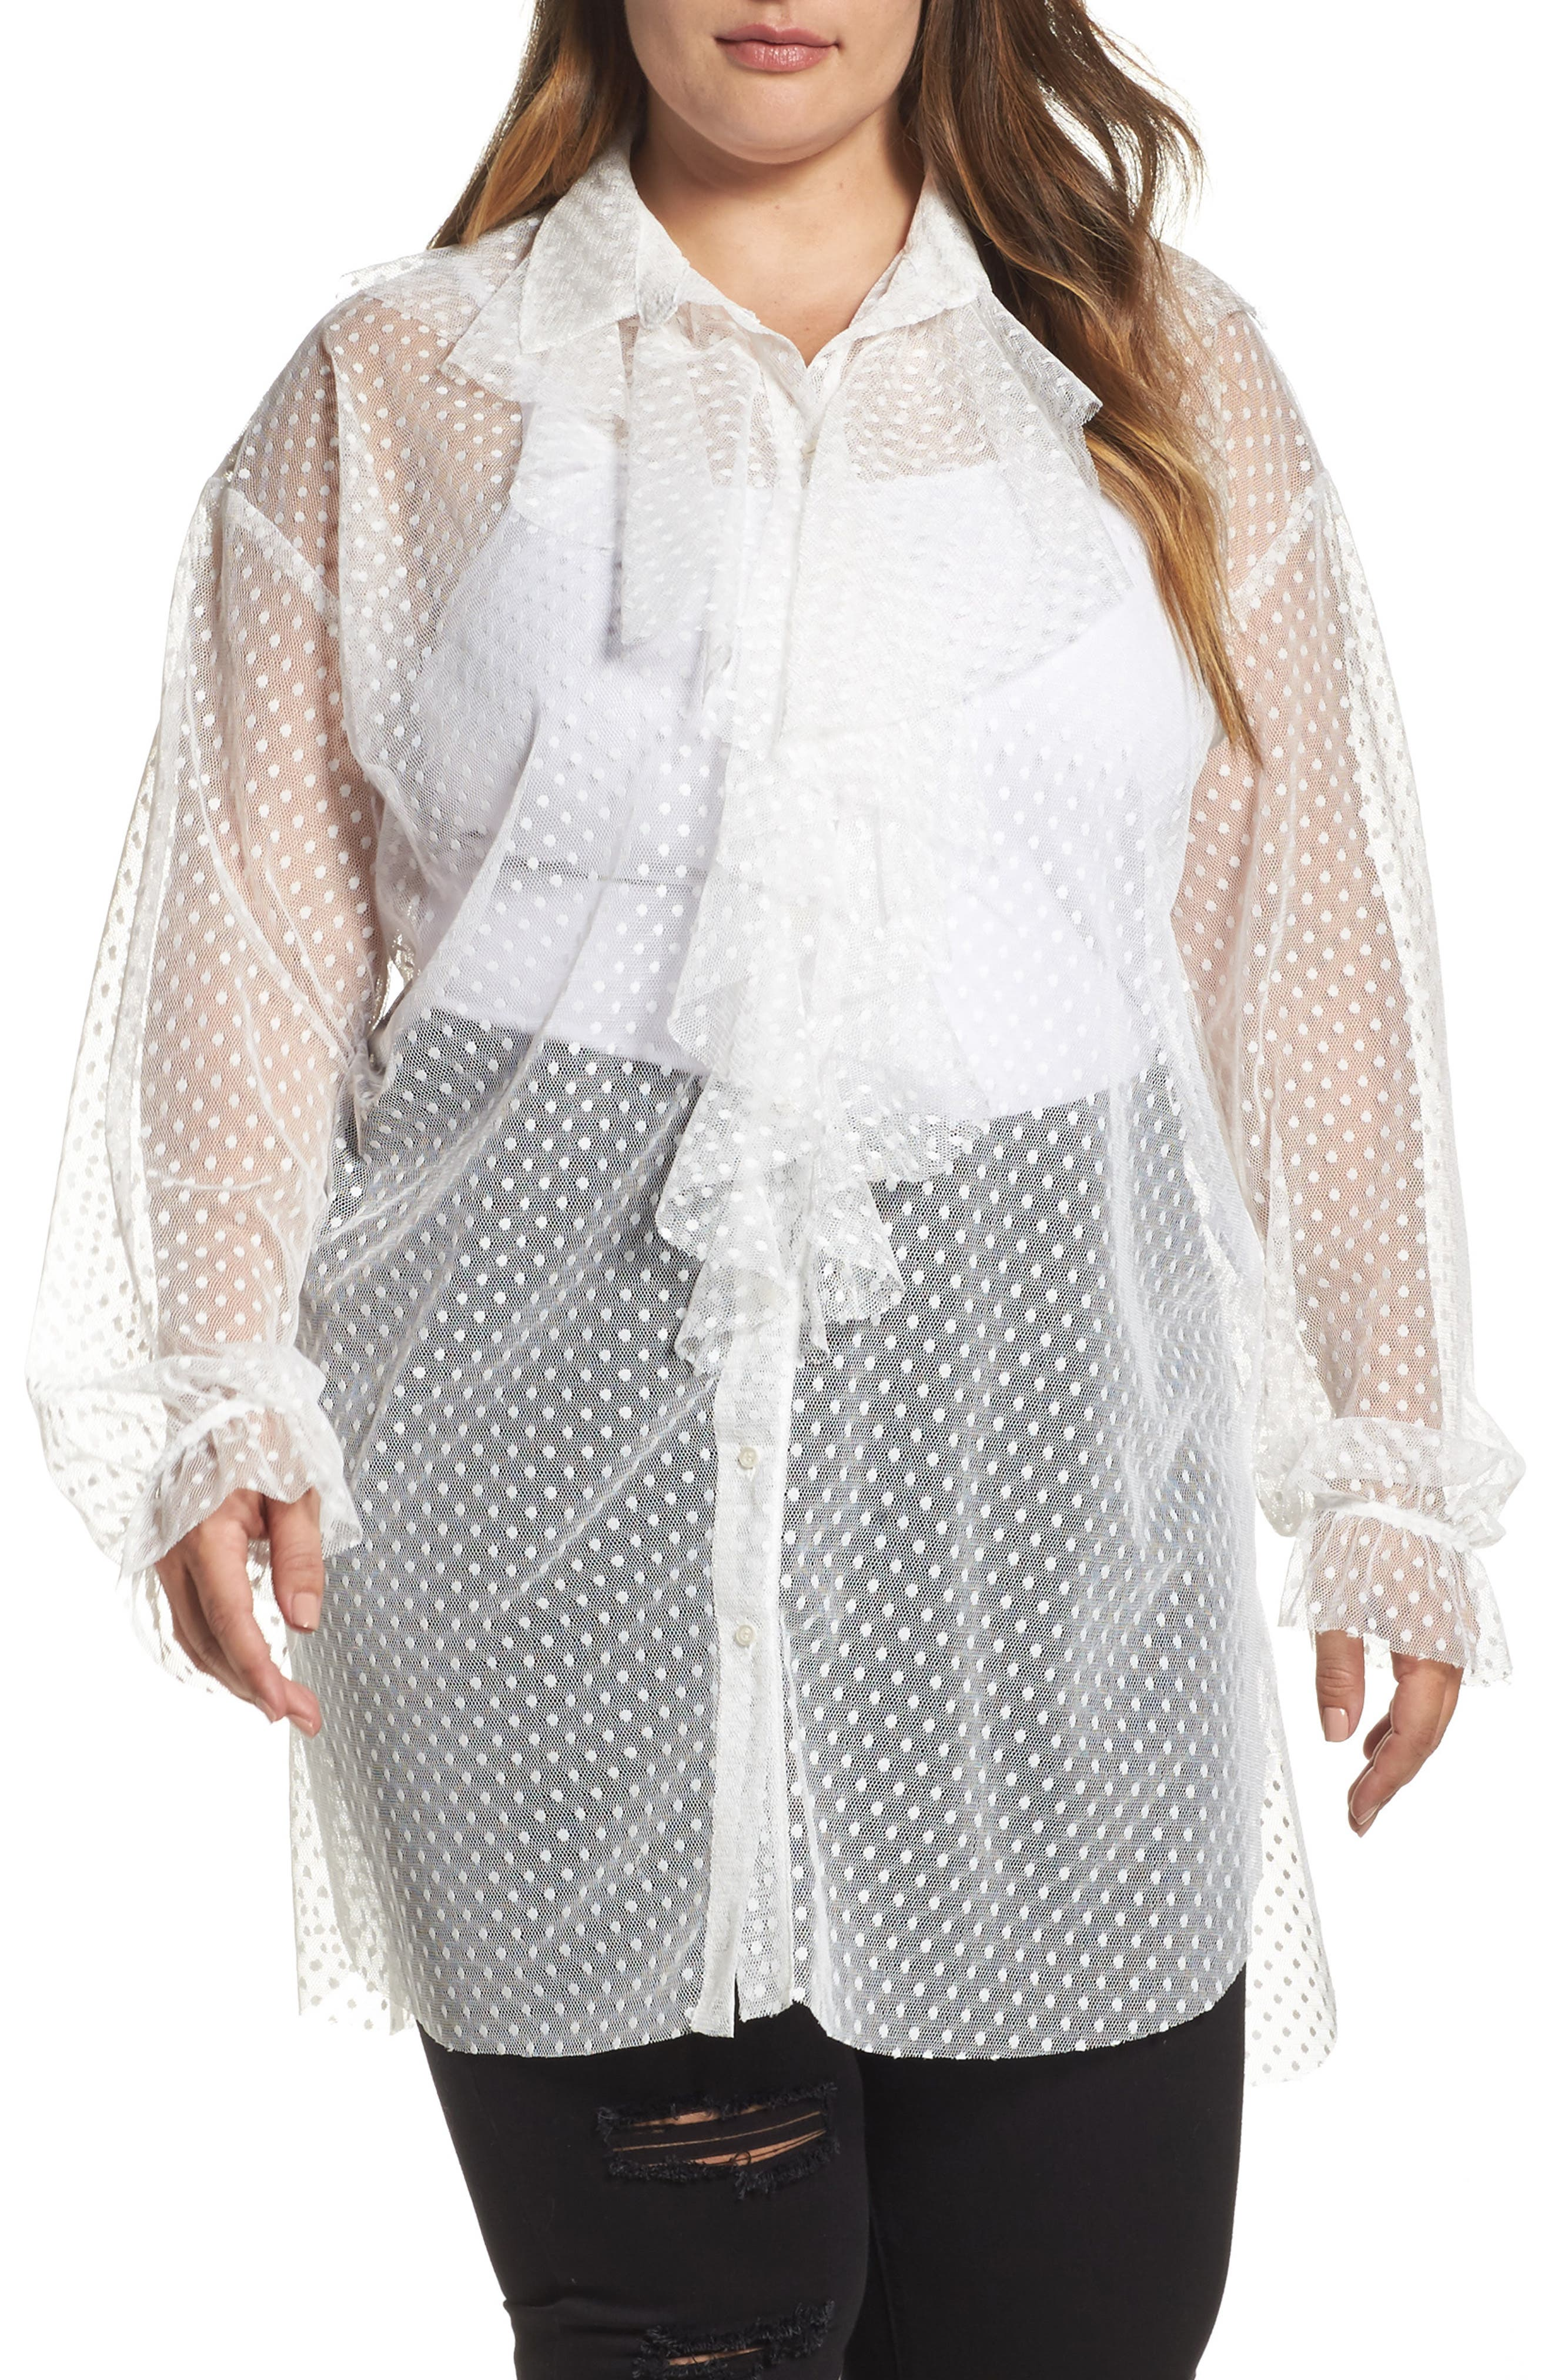 Main Image - ELVI Polka Dot Mesh Ruffle Tunic Shirt (Plus Size)